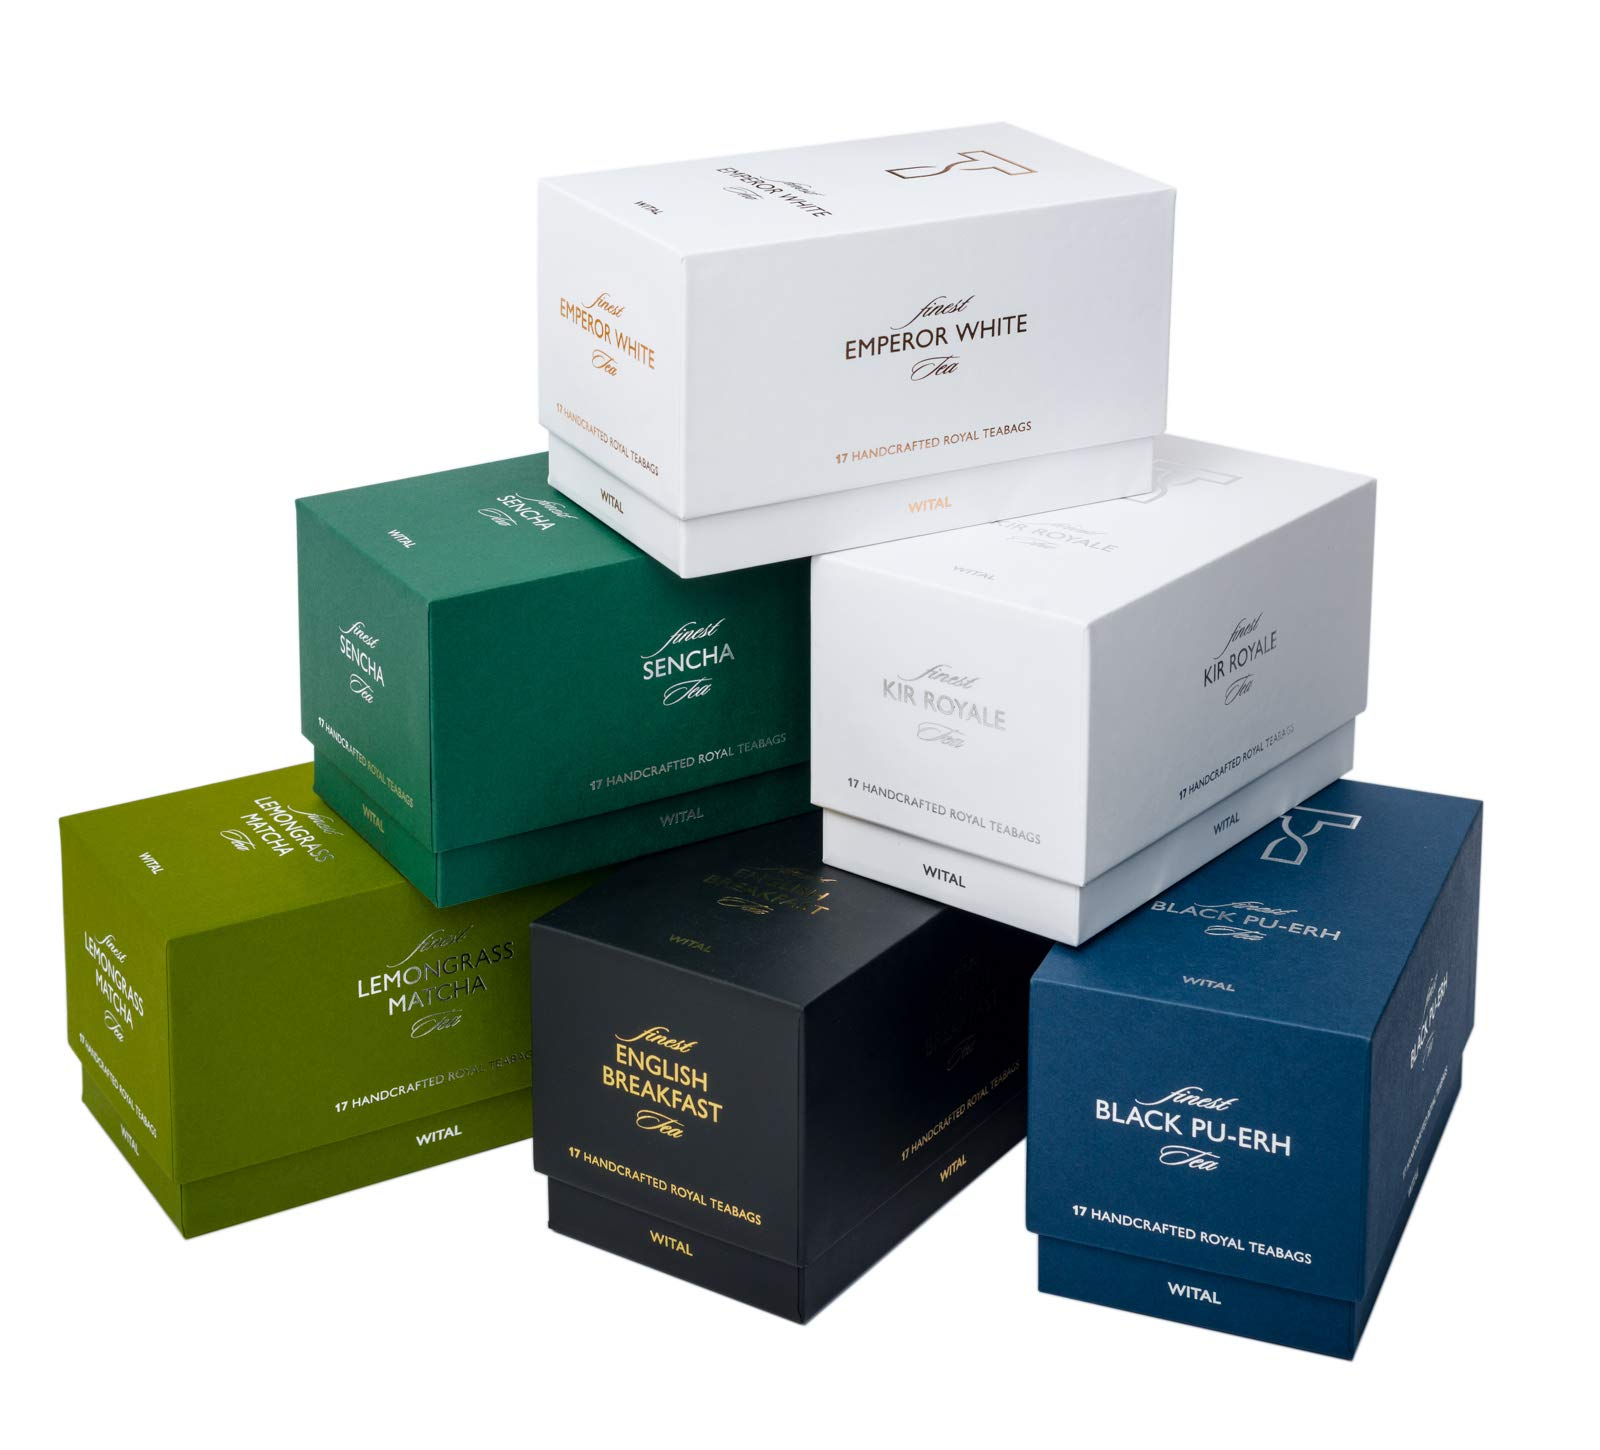 WITAL-TEA-GINGER-CINNAMON-BLACK-PEPPER-Ingwer-Zimt-Tee-Aromatisierter-Schwarzer-Tee-Mischung-17-plastikfreie-Teebeutel